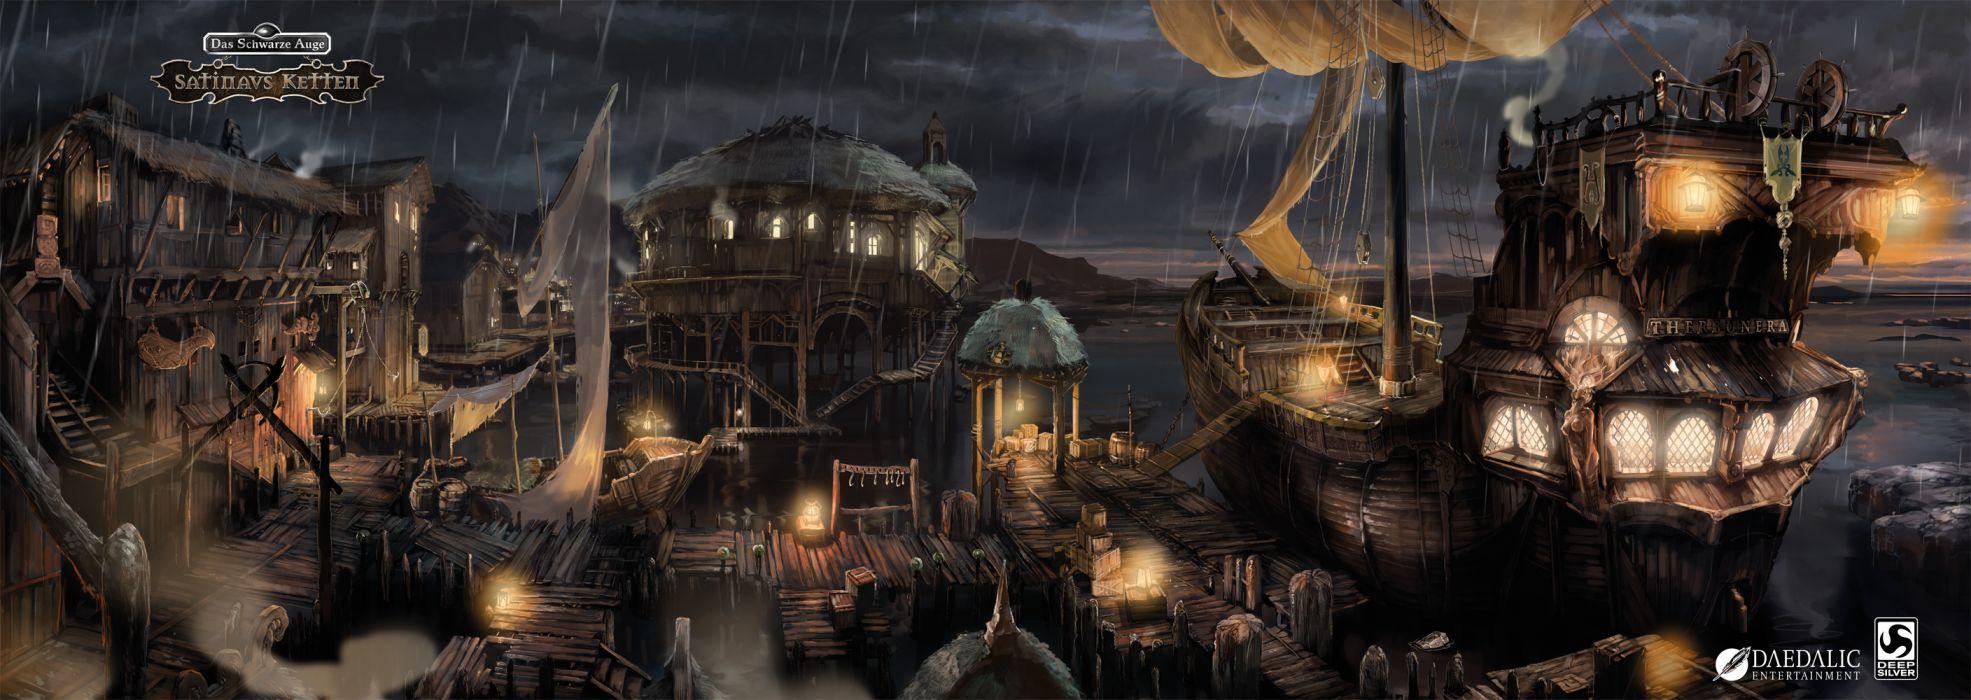 THE DARK EYE fantasy adventure the-dark-eye (35) wallpaper